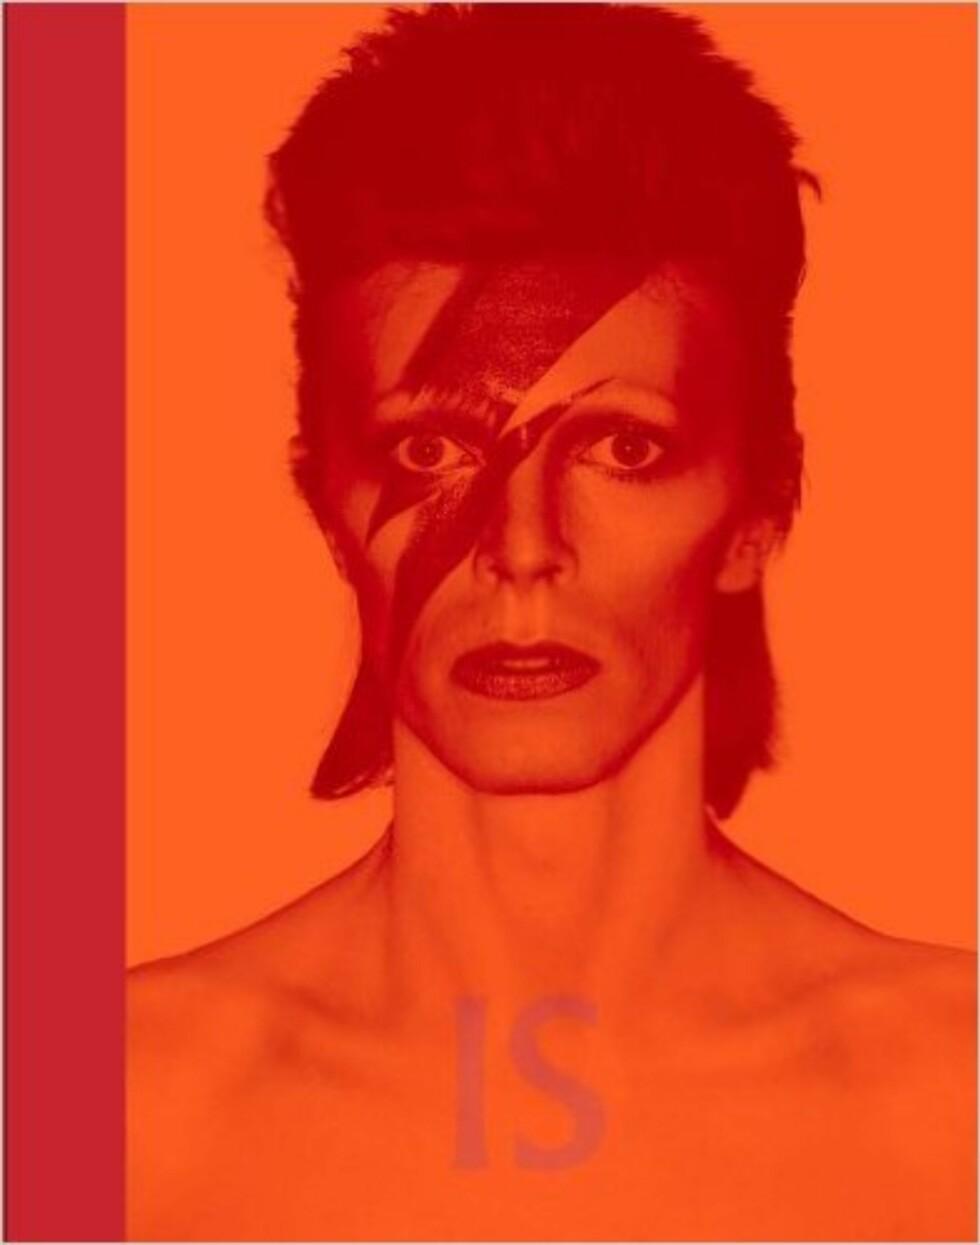 David Bowie via Amazon.com, kr 330.